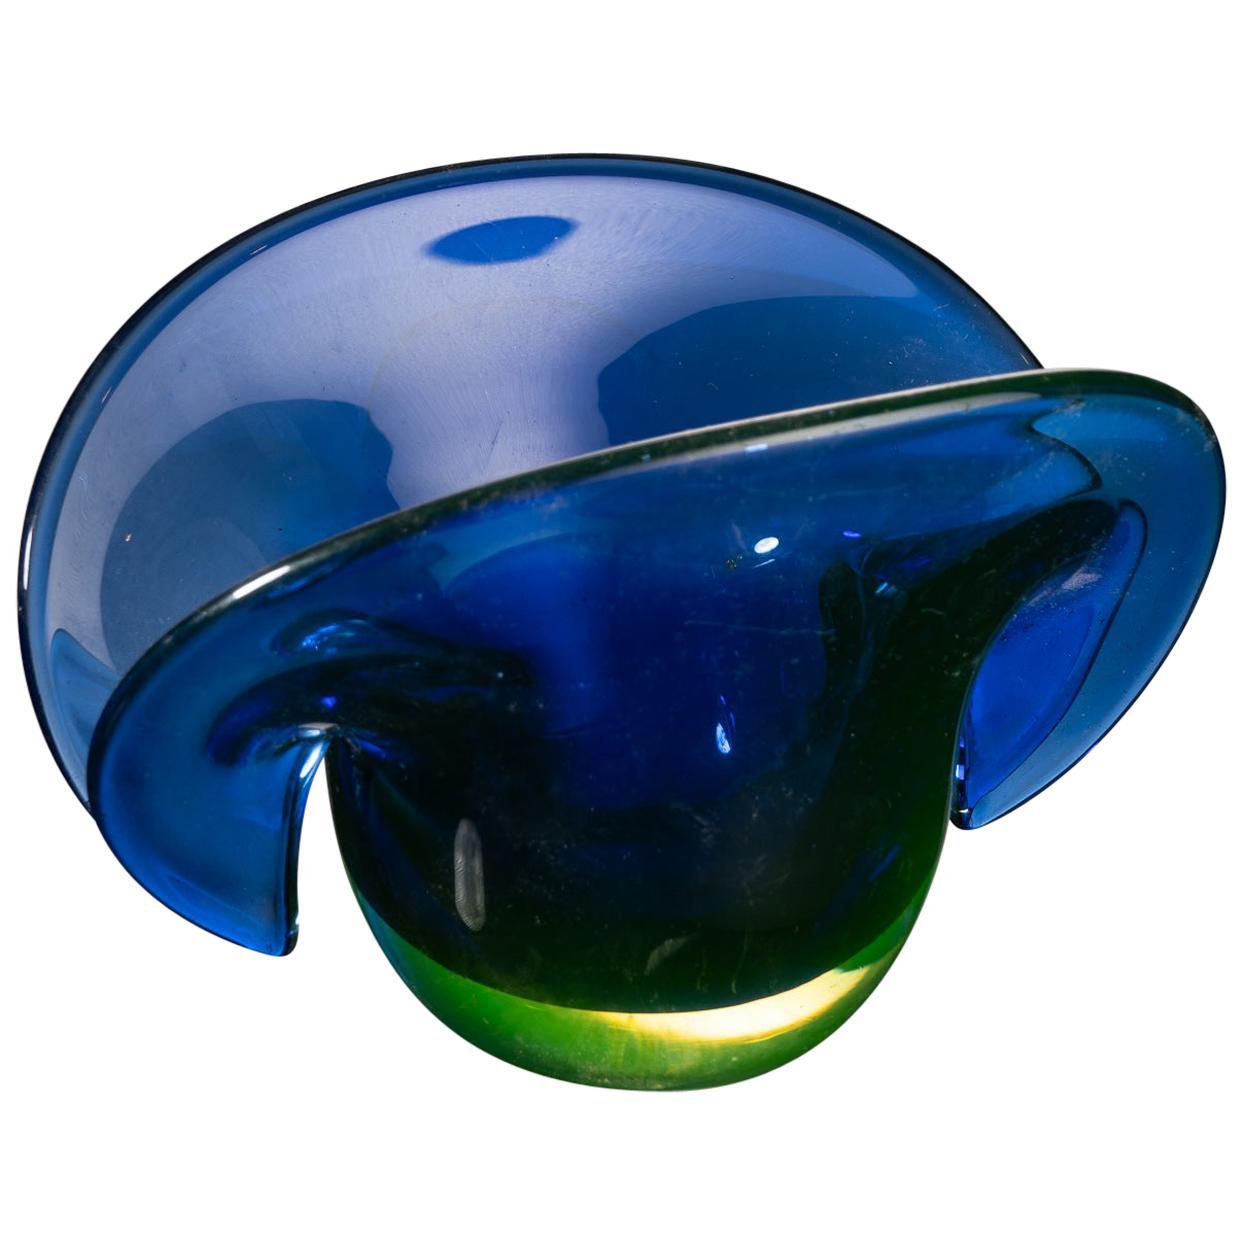 Murano Art Glass Split Top Blue and Green Vase